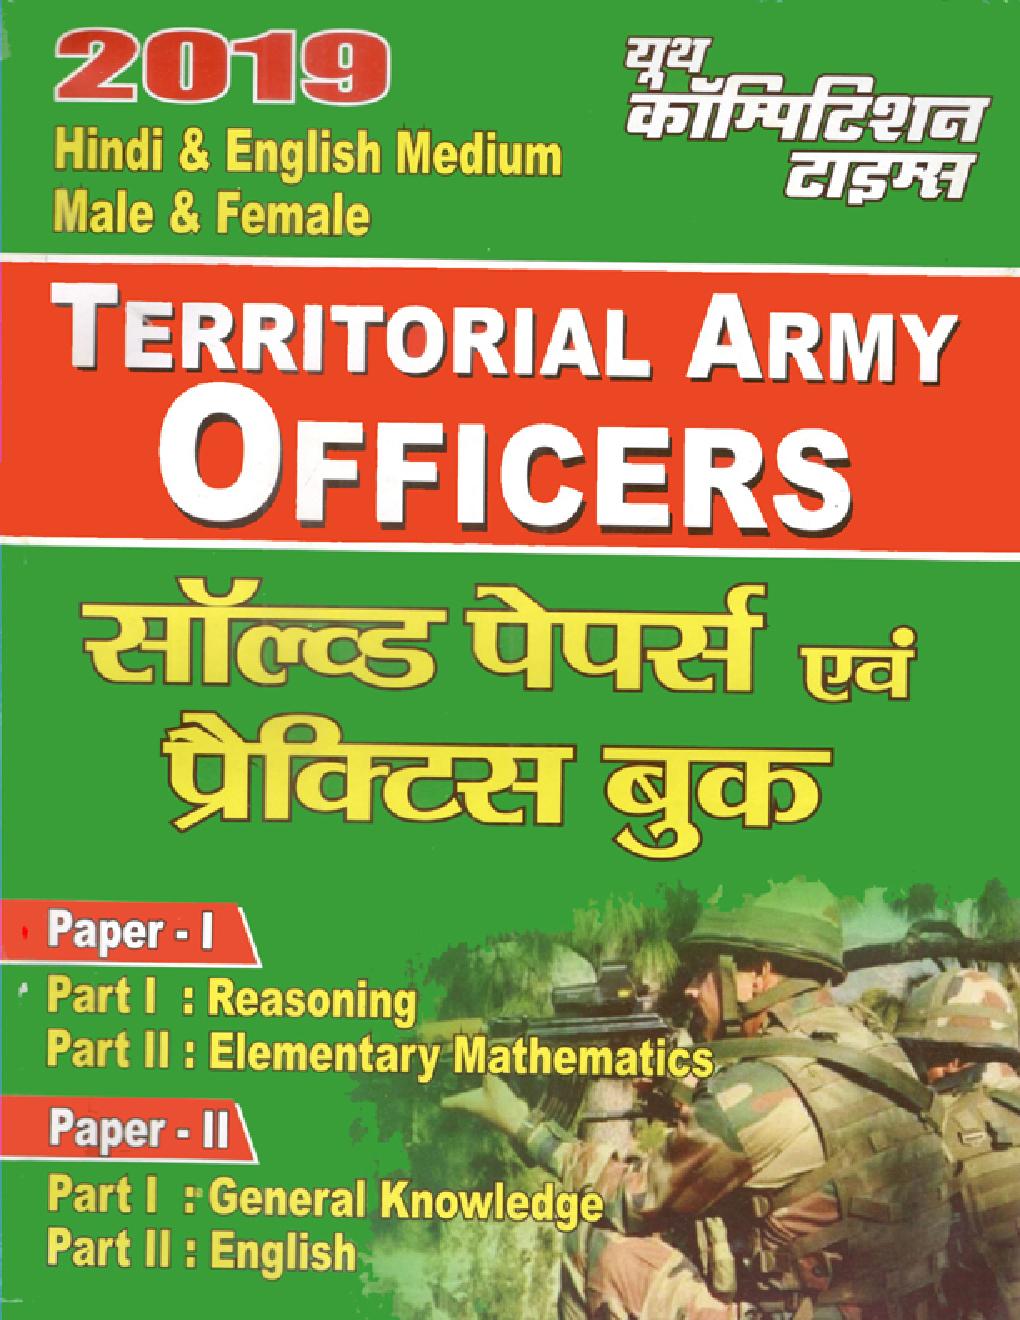 Territorial Army Officers साल्व्ड पेपर्स & प्रैक्टिस बुक Paper - I & II (2019) - Page 1